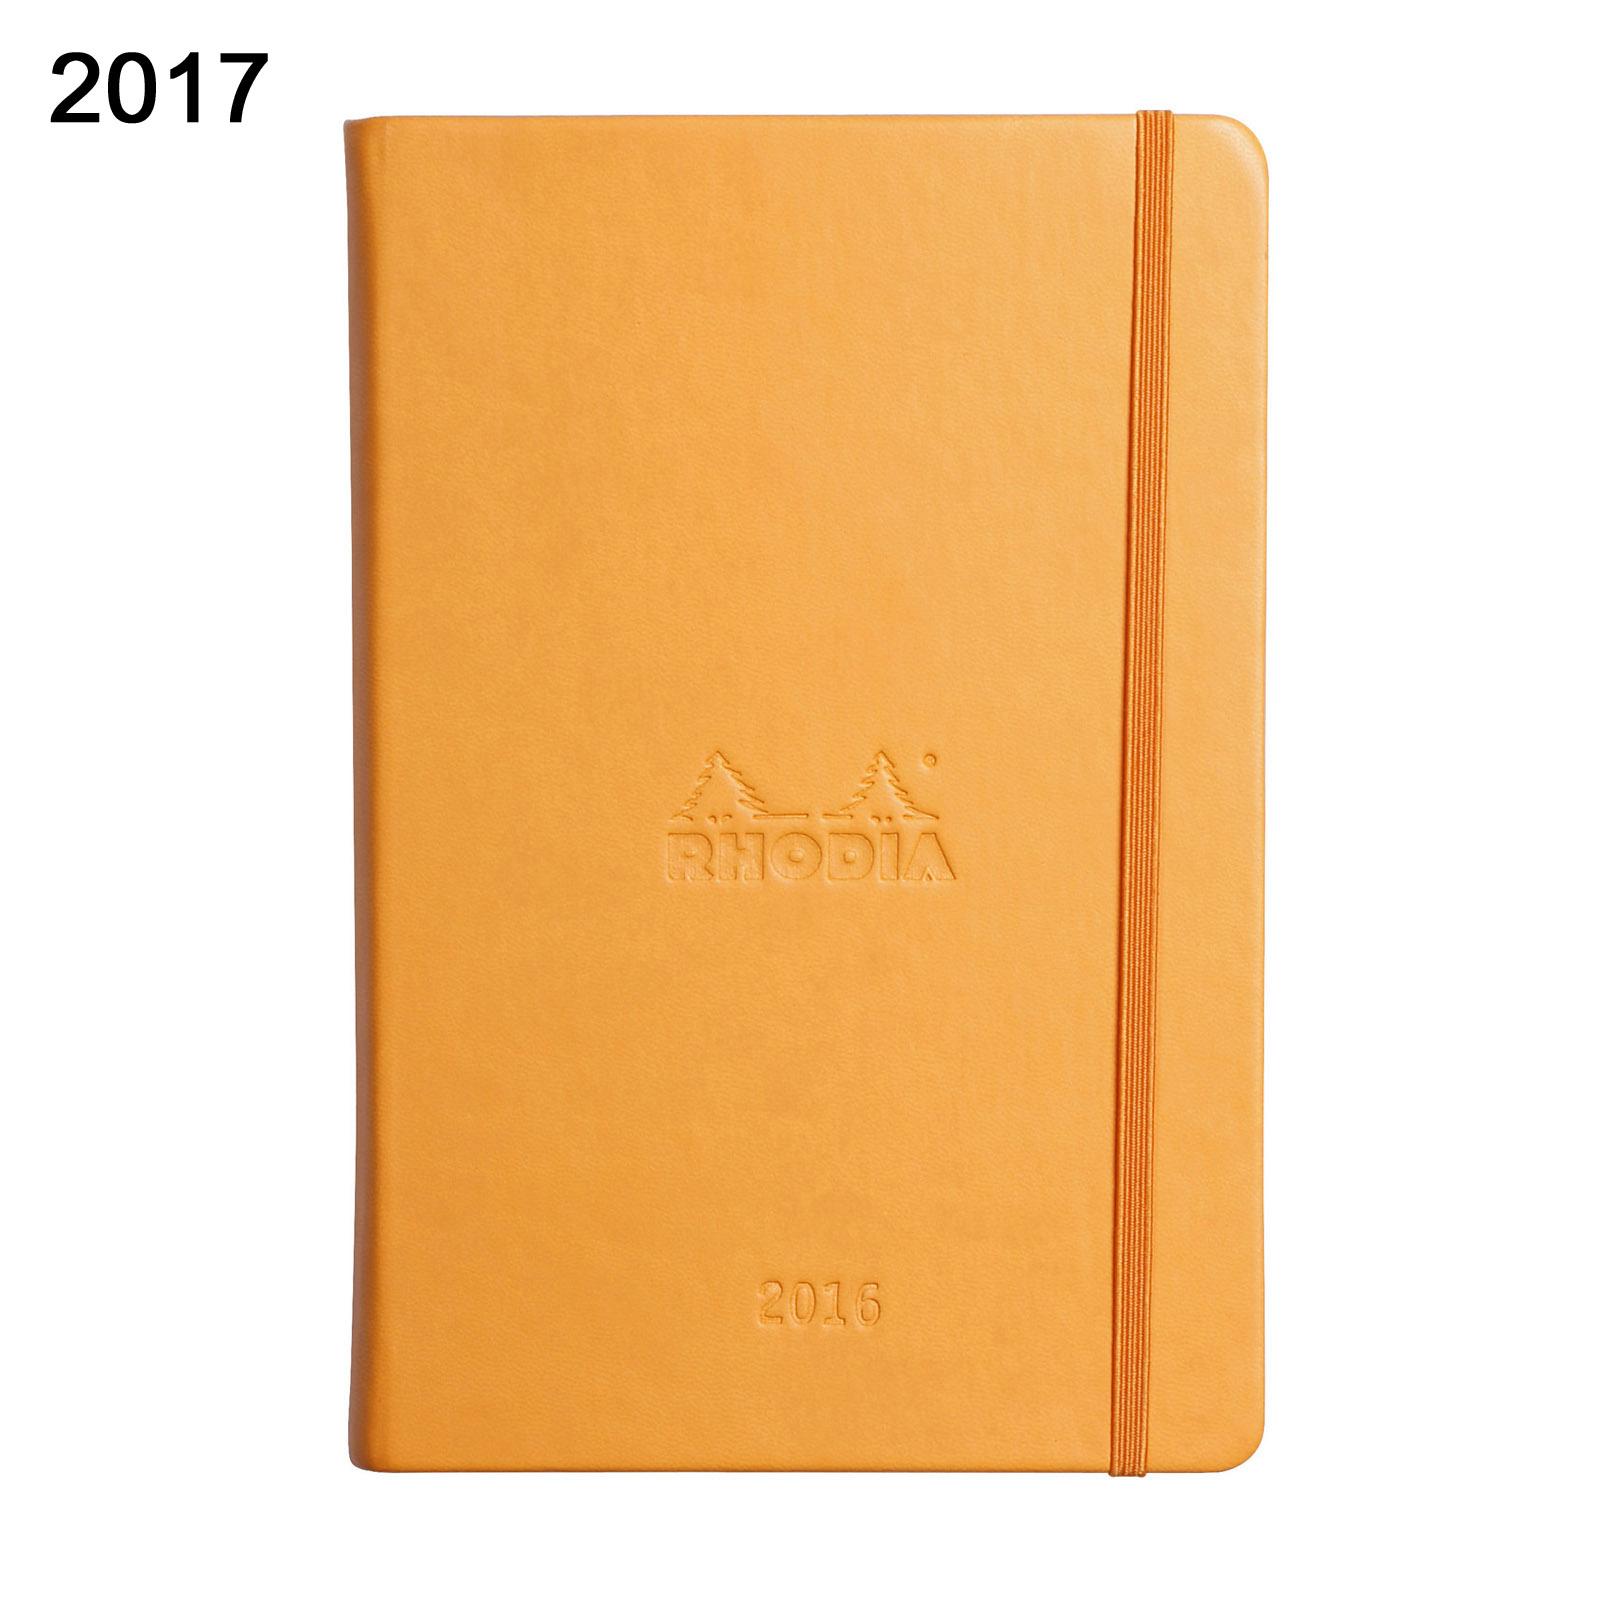 Rhodia 2017 Weekly Webplanner Notebook 6 1 4 X 9 3 8